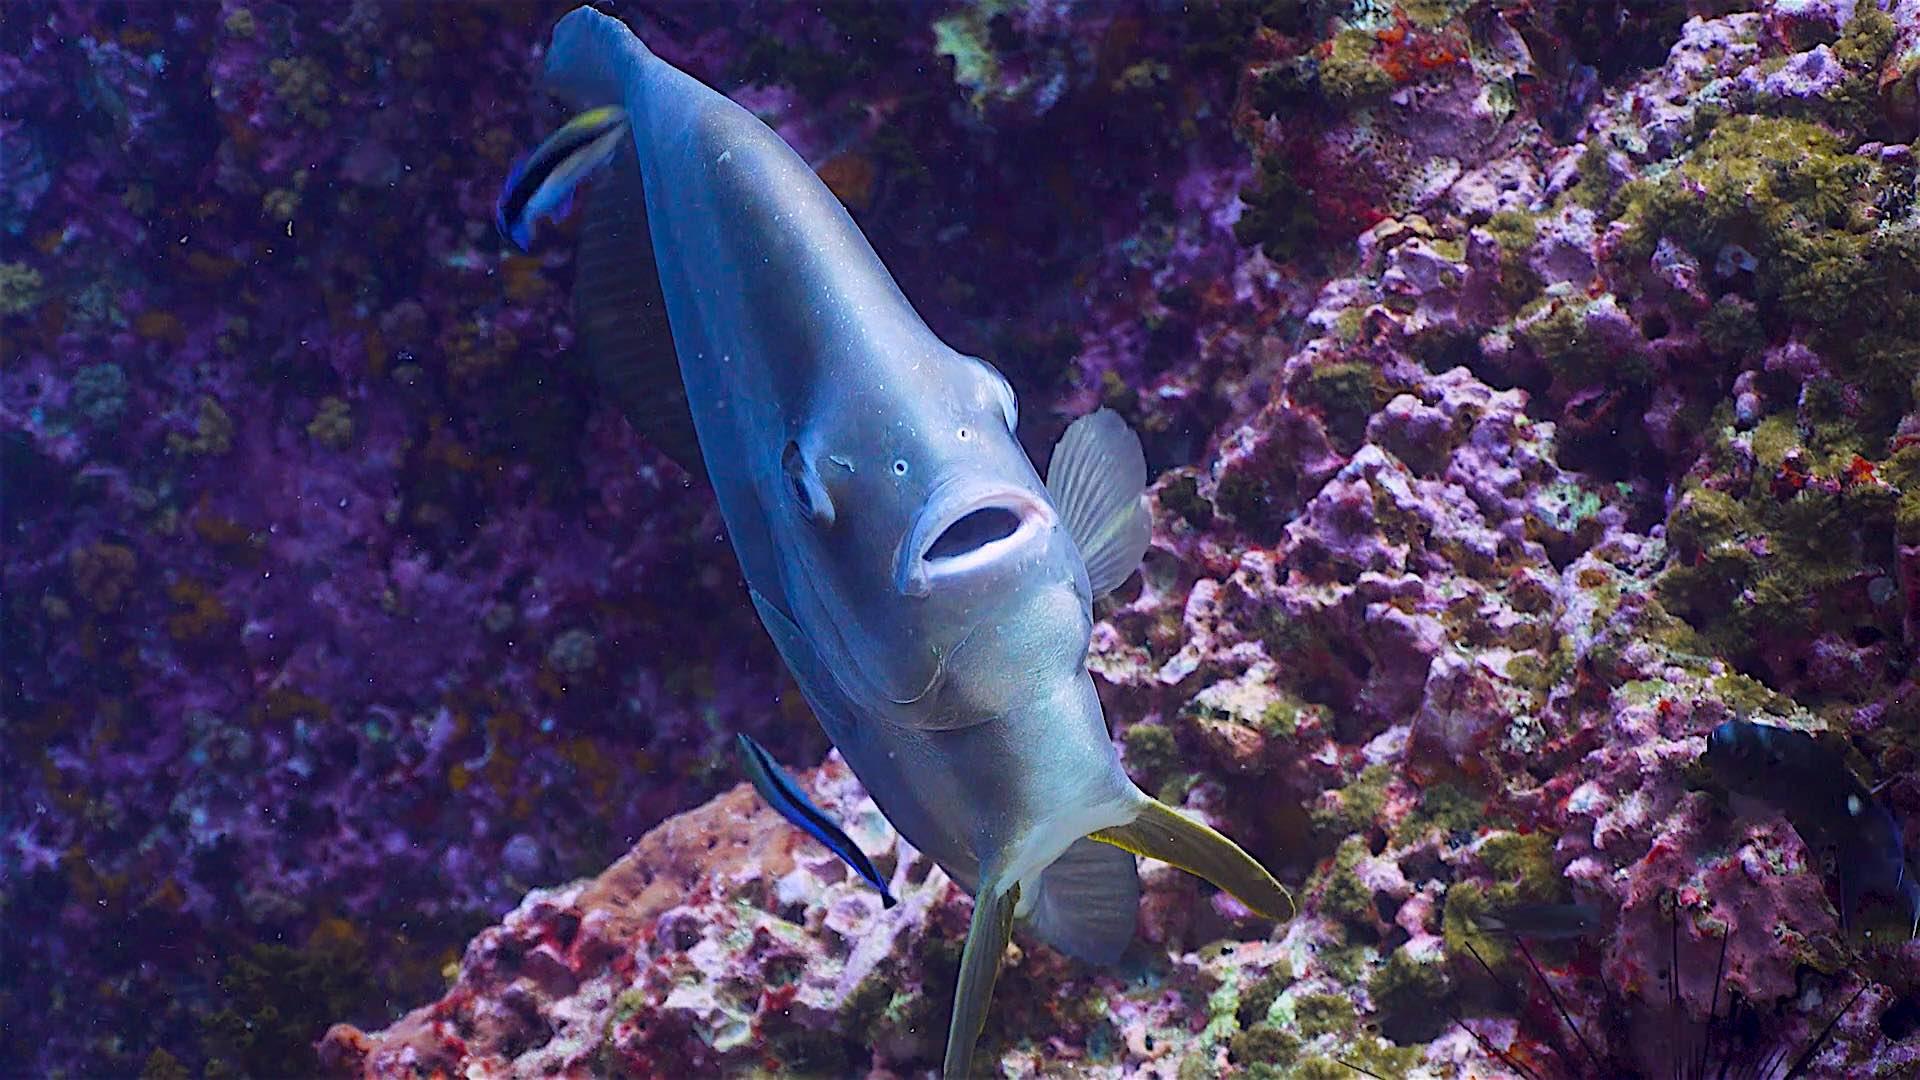 www.thefunkyturtle.com sail rock dive site koh tao batfish